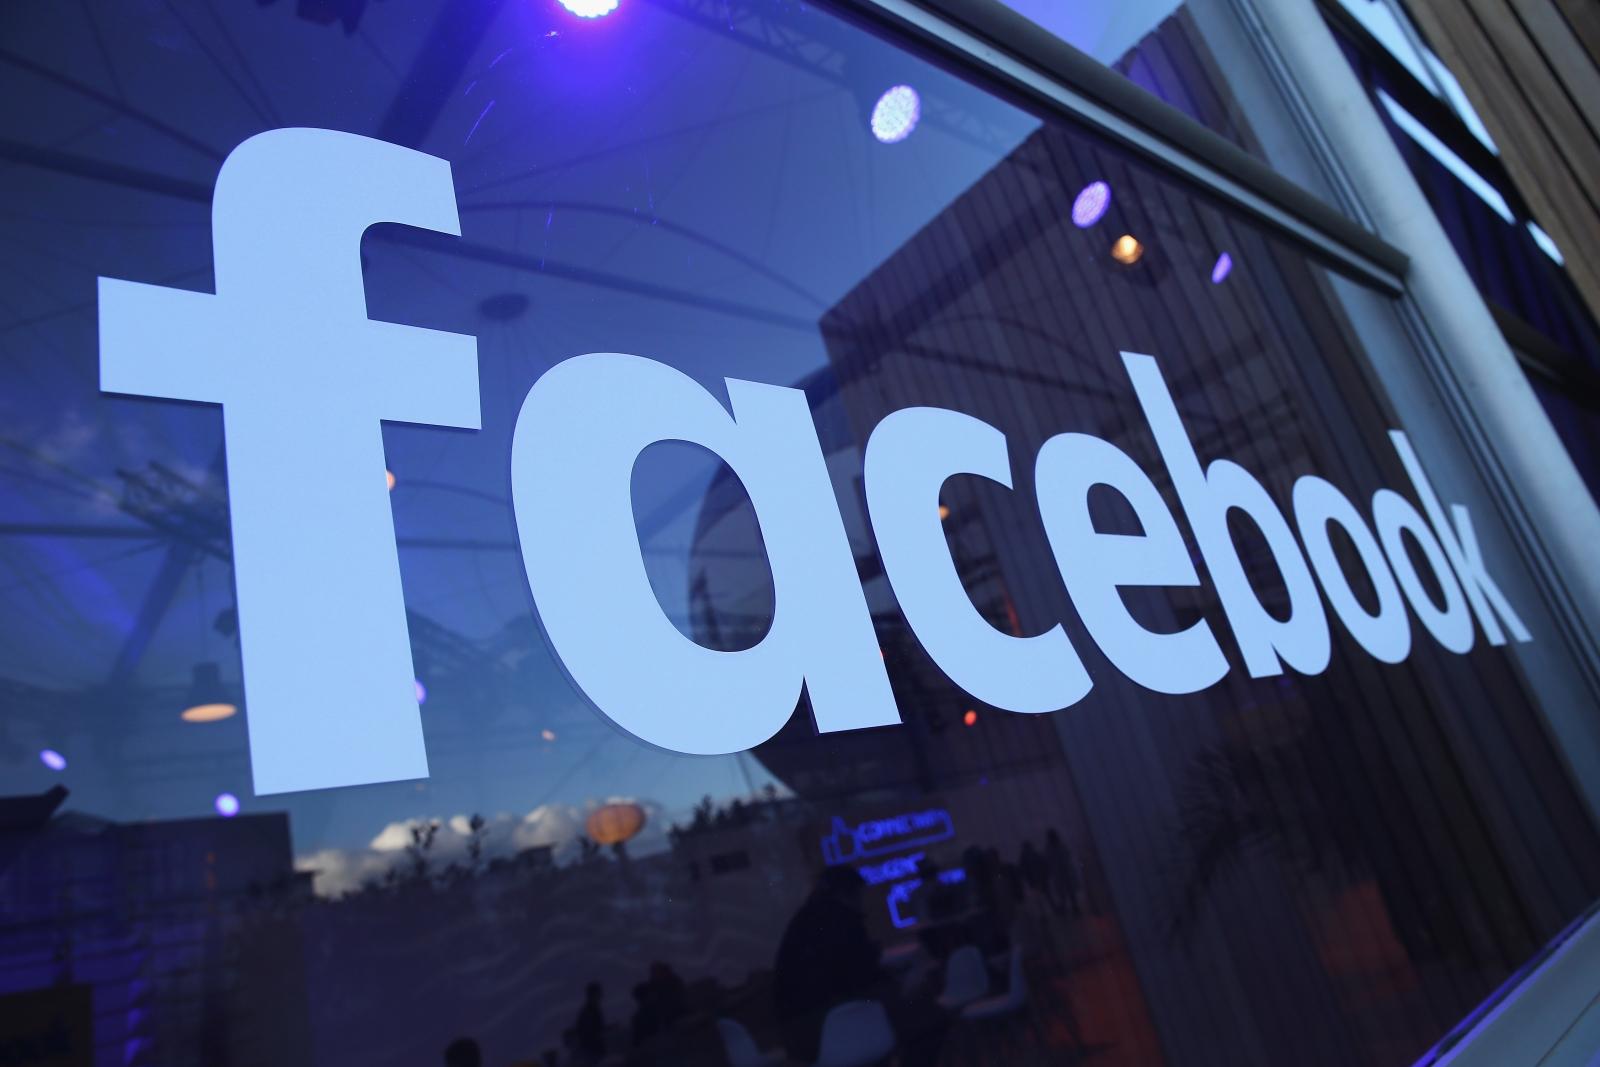 CNIL fined Facebook 150,000 euros